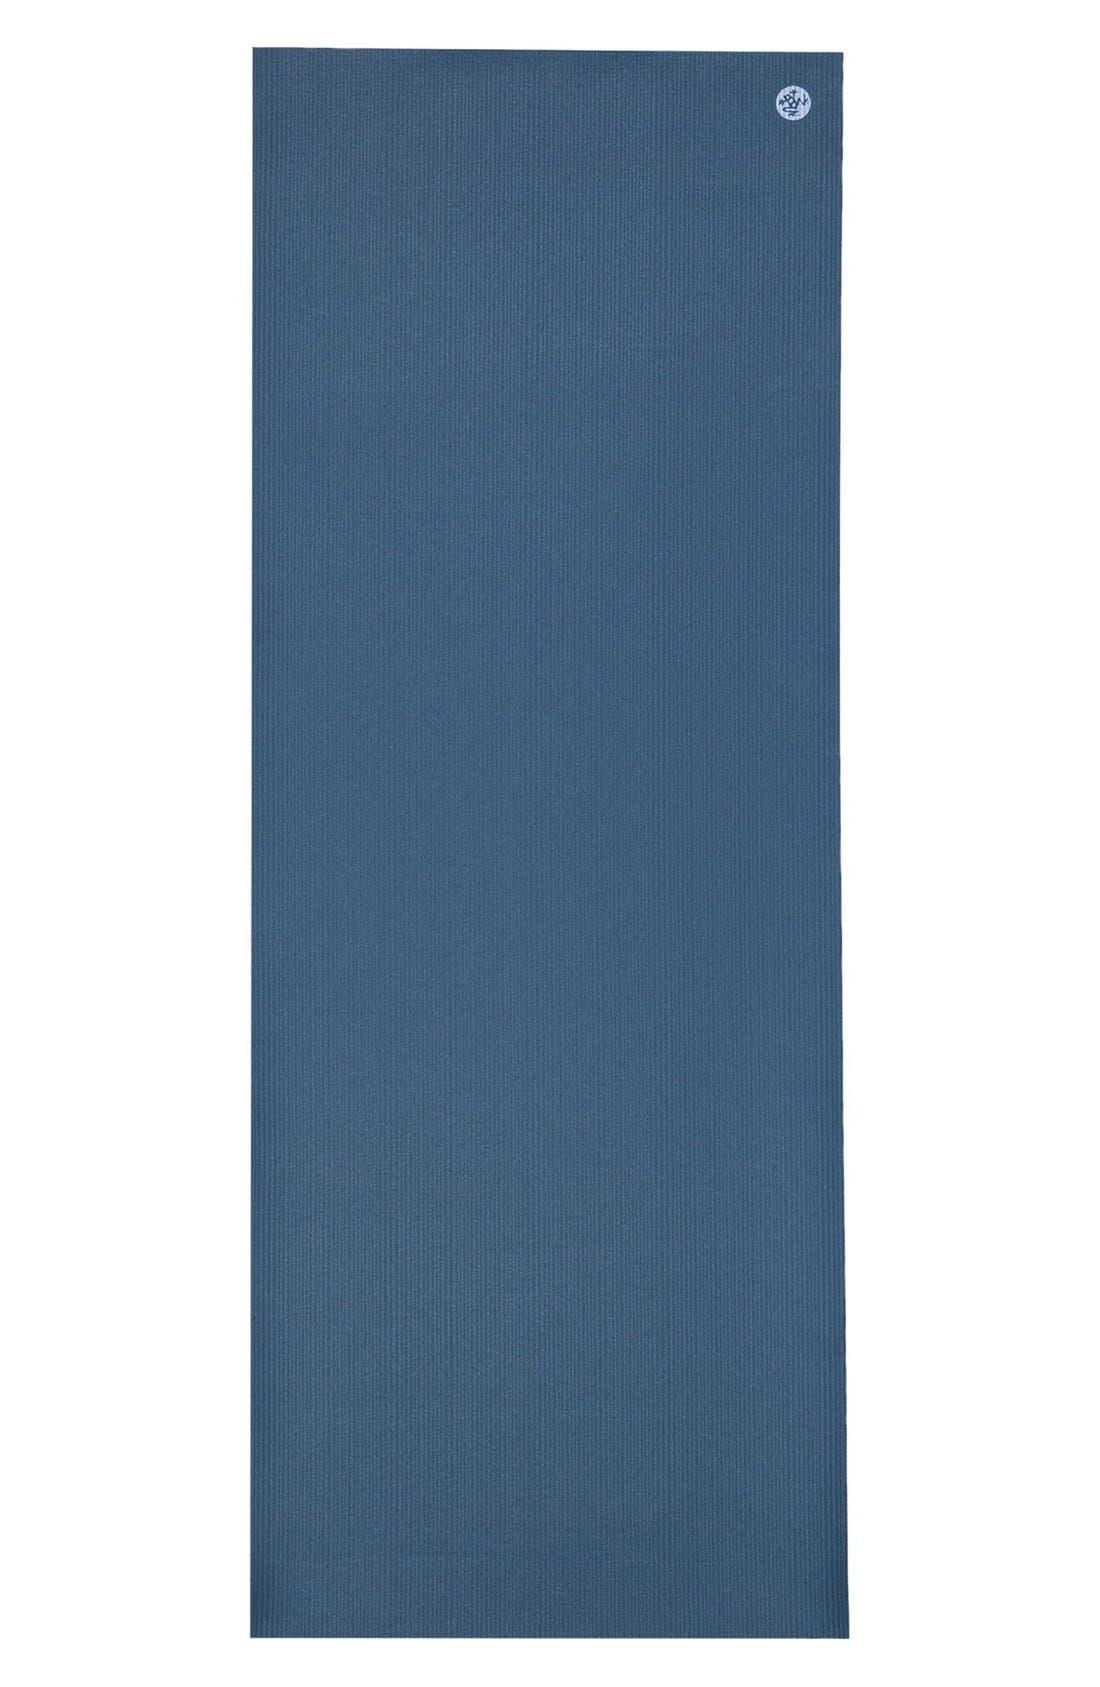 'PRO71 - Odyssey' Yoga Mat,                             Alternate thumbnail 2, color,                             401